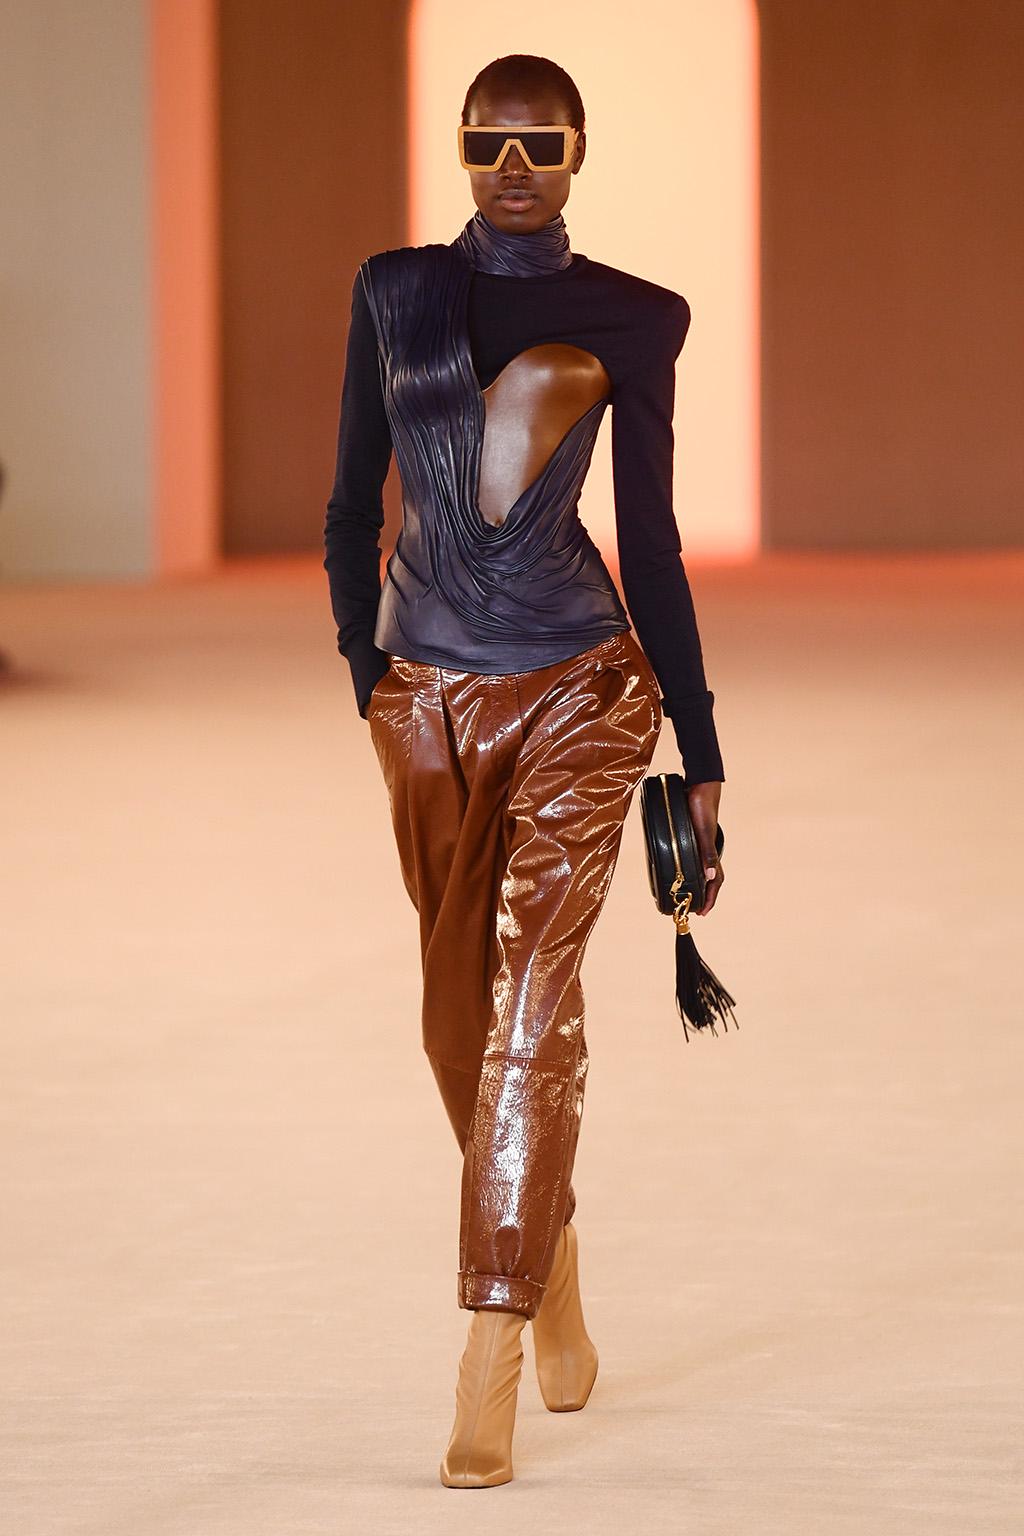 Model on the catwalkBalmain show, Runway, Fall Winter 2020, Paris Fashion Week, France - 28 Feb 2020